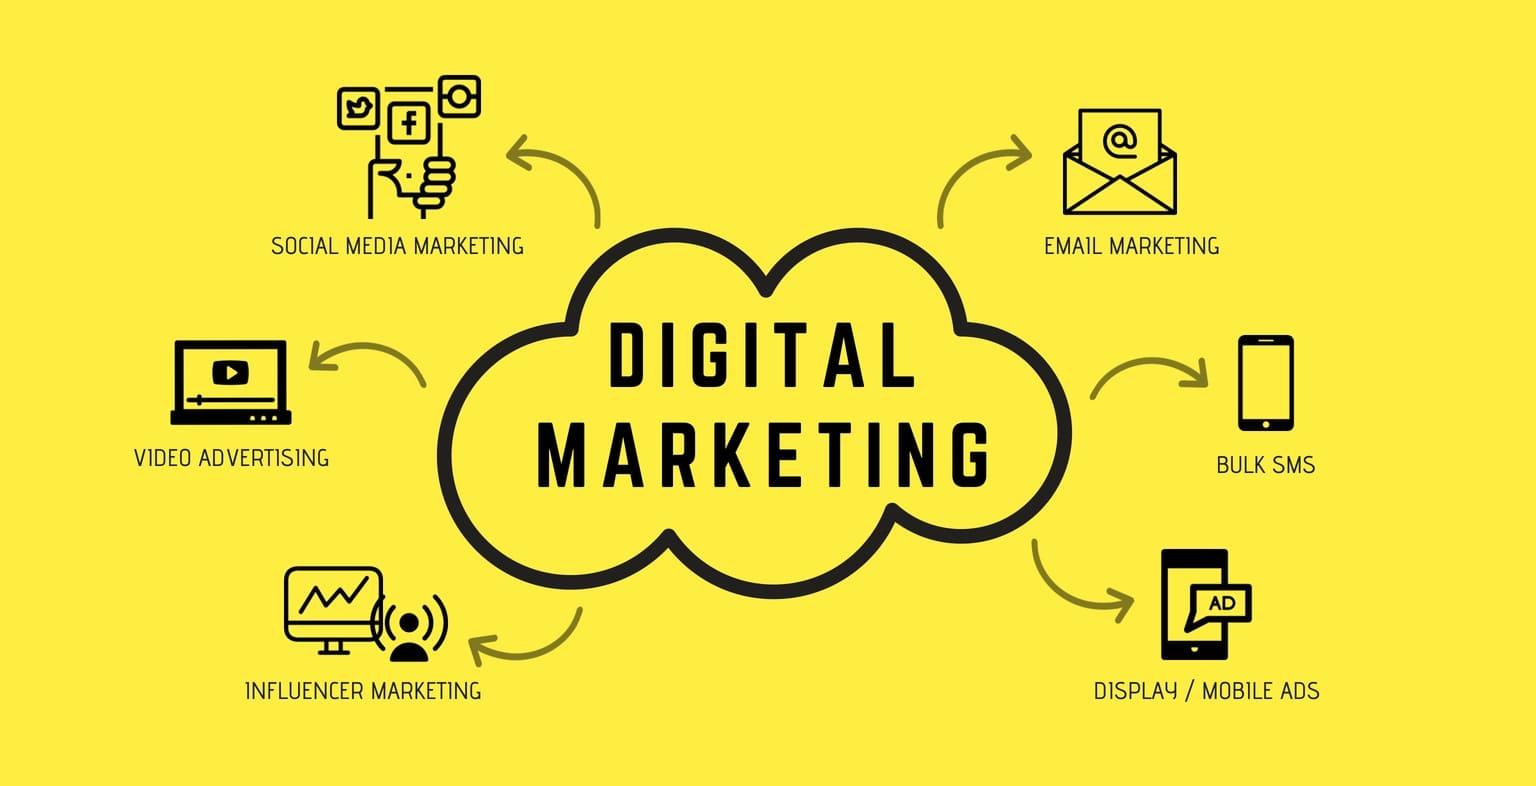 most-promising-digital-marketing-companies-in-india-in-2021-inventiva.jpg